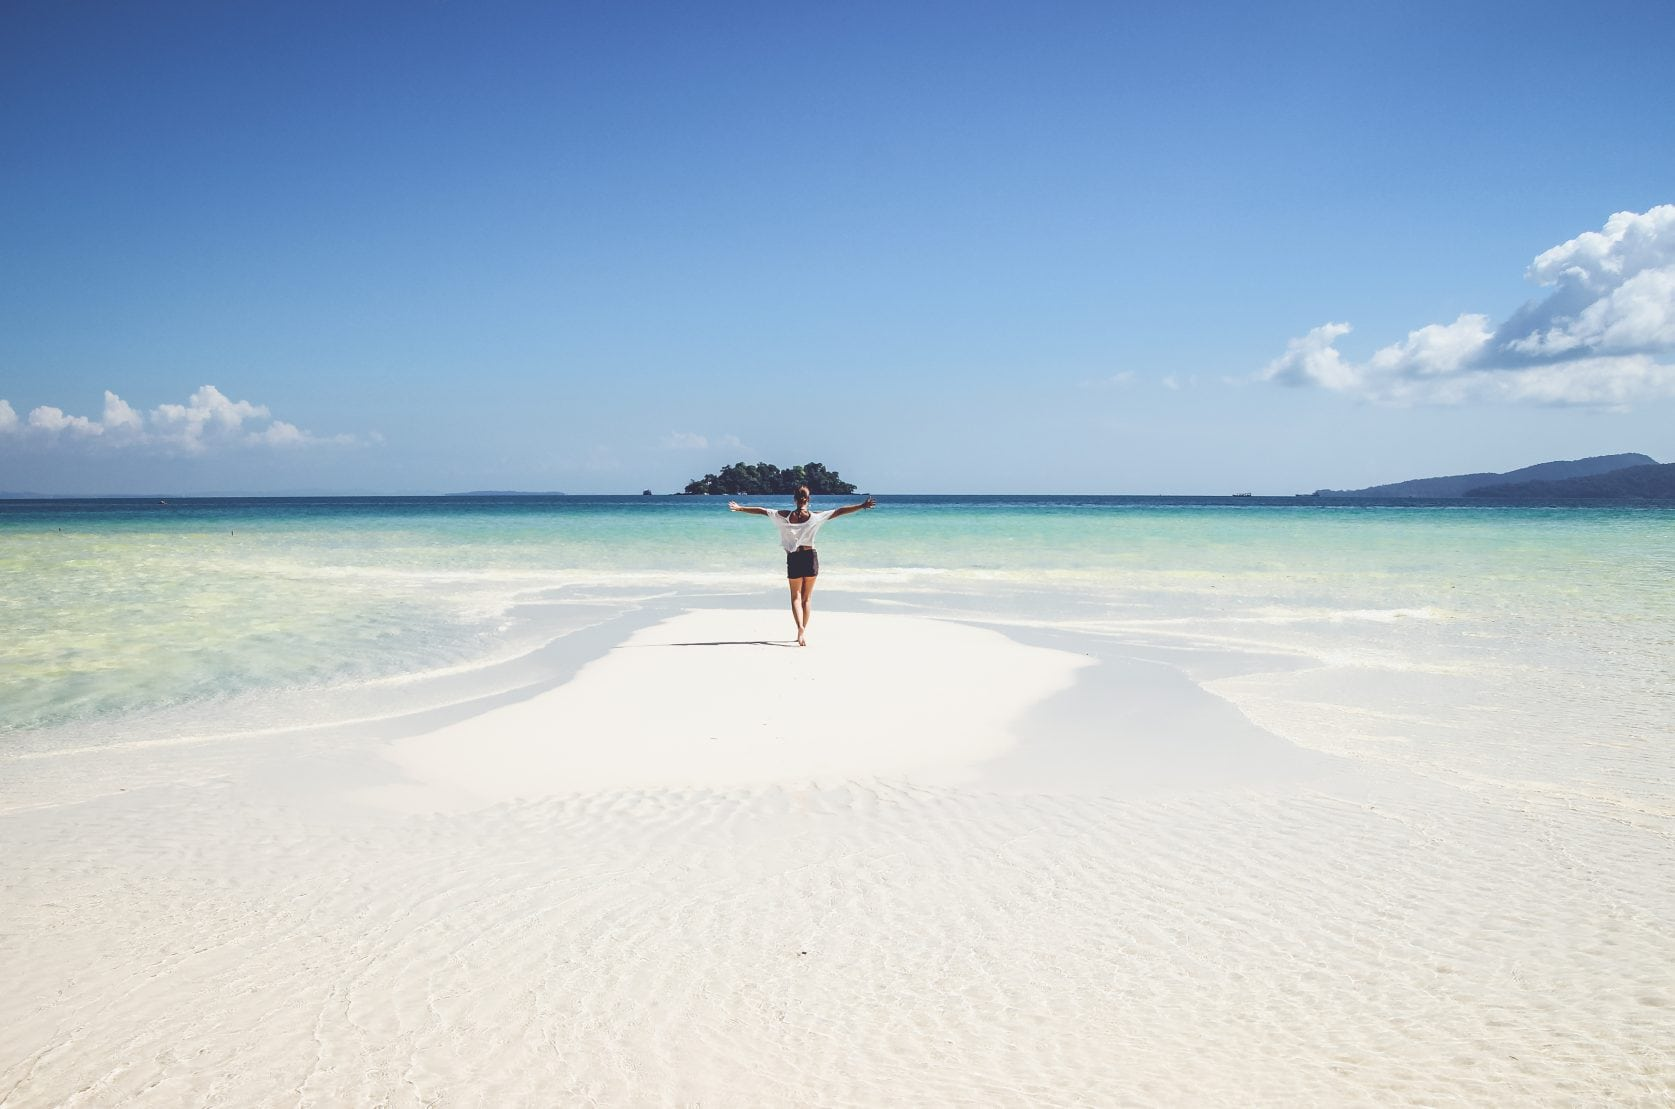 4k beach koh rong